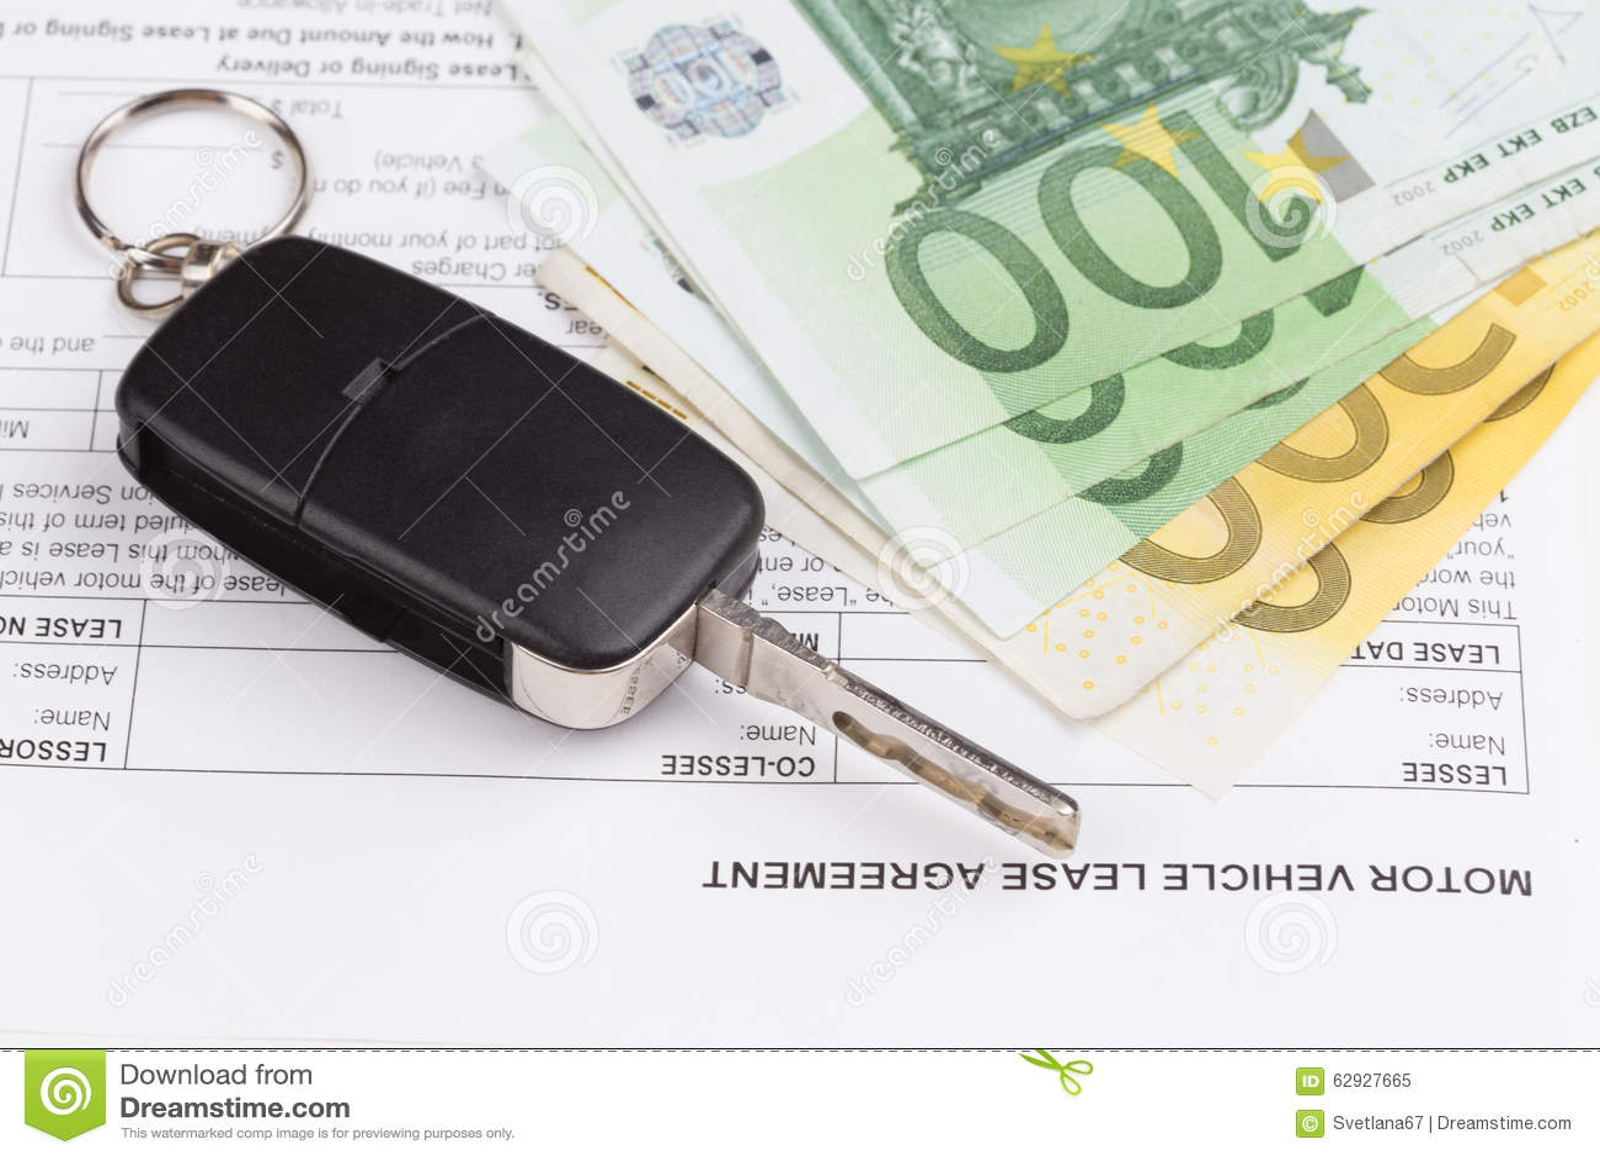 Lease Motor Vehicle Document Agreement Stock Photo Image